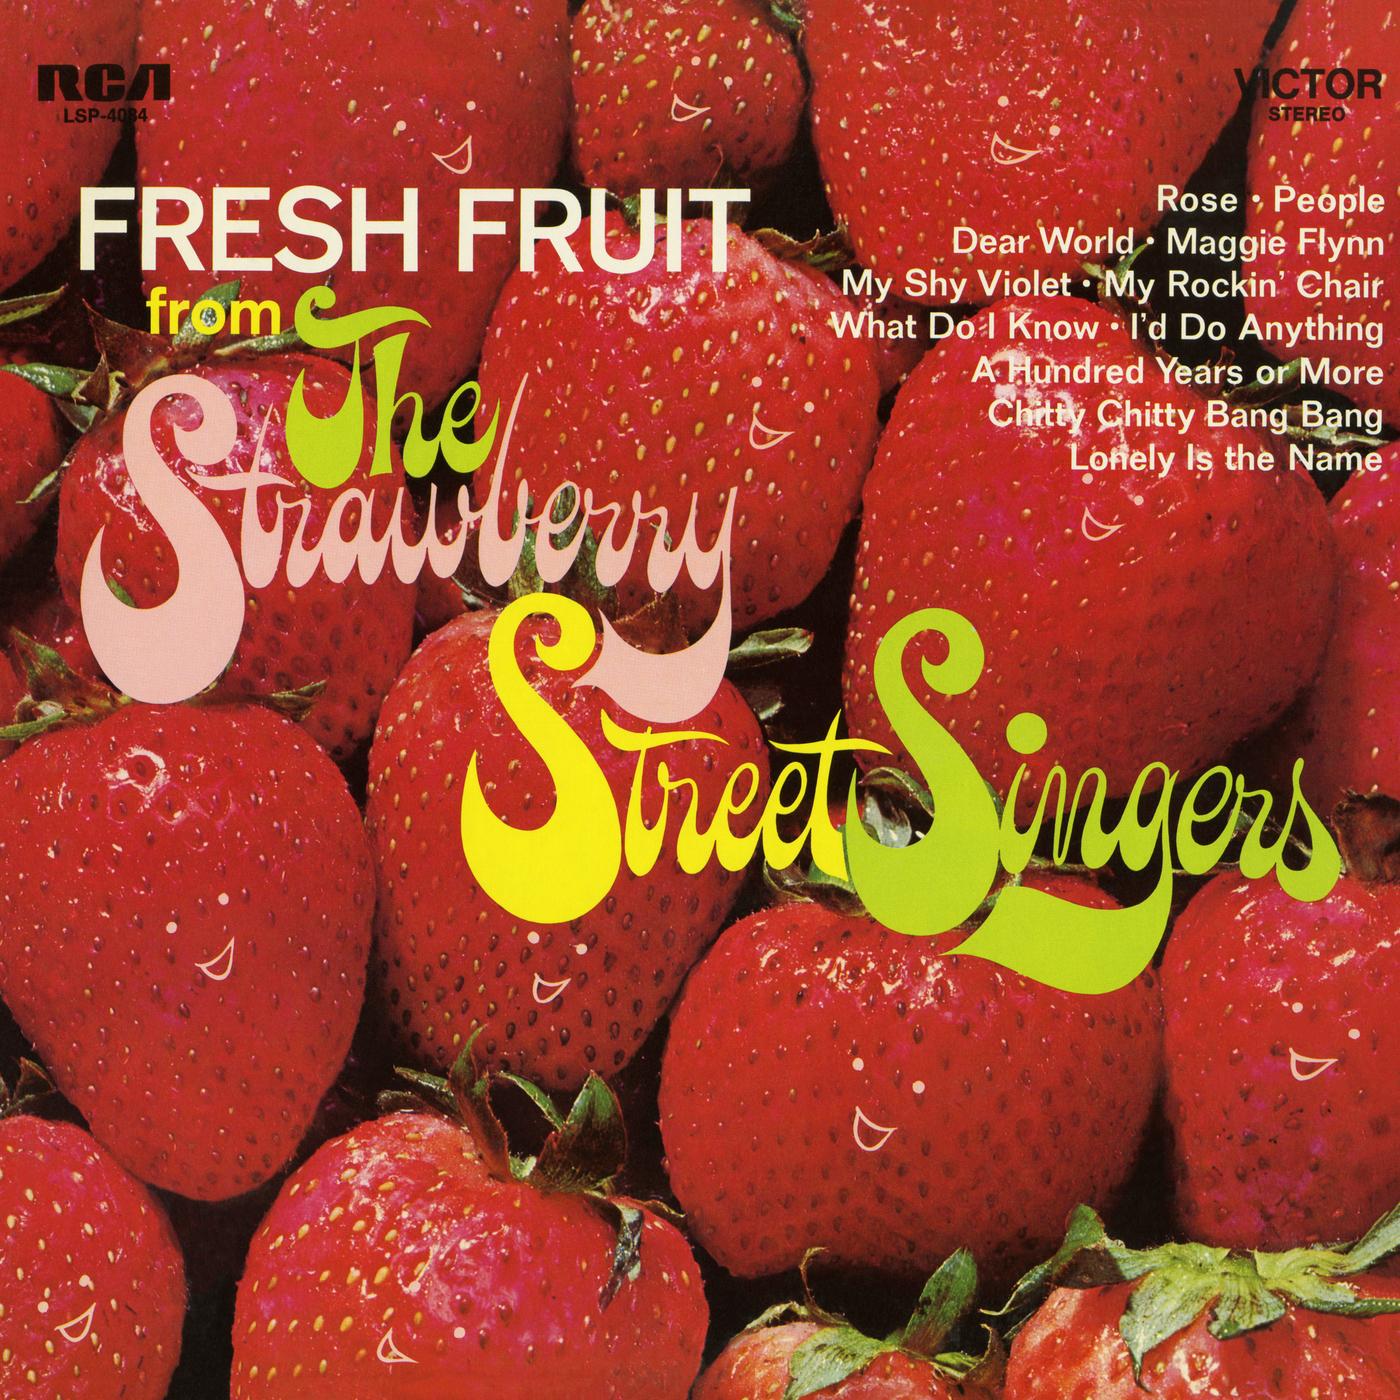 Fresh Fruit - The Strawberry Street Singers